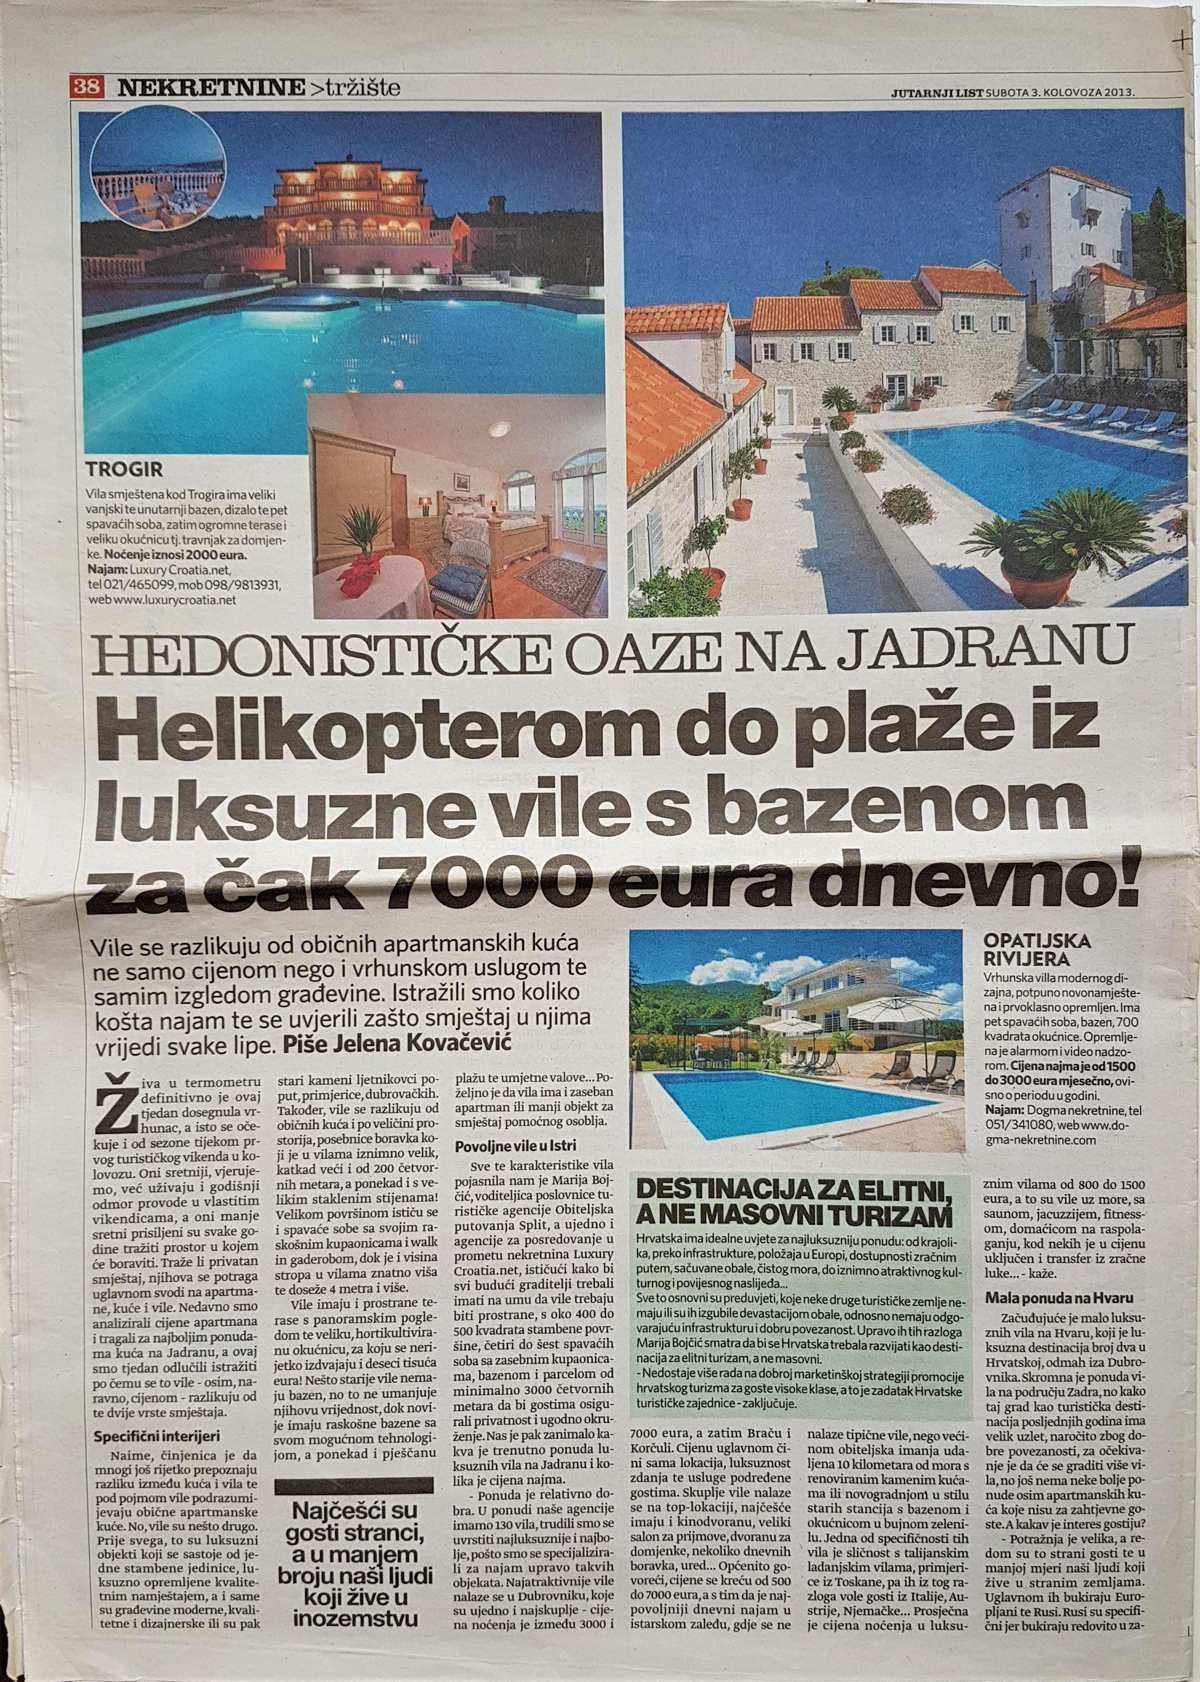 Interview with Marija Bojcic about Croatian villas rent, National daily newspapers Jutarnji Real Estate, August 2013.